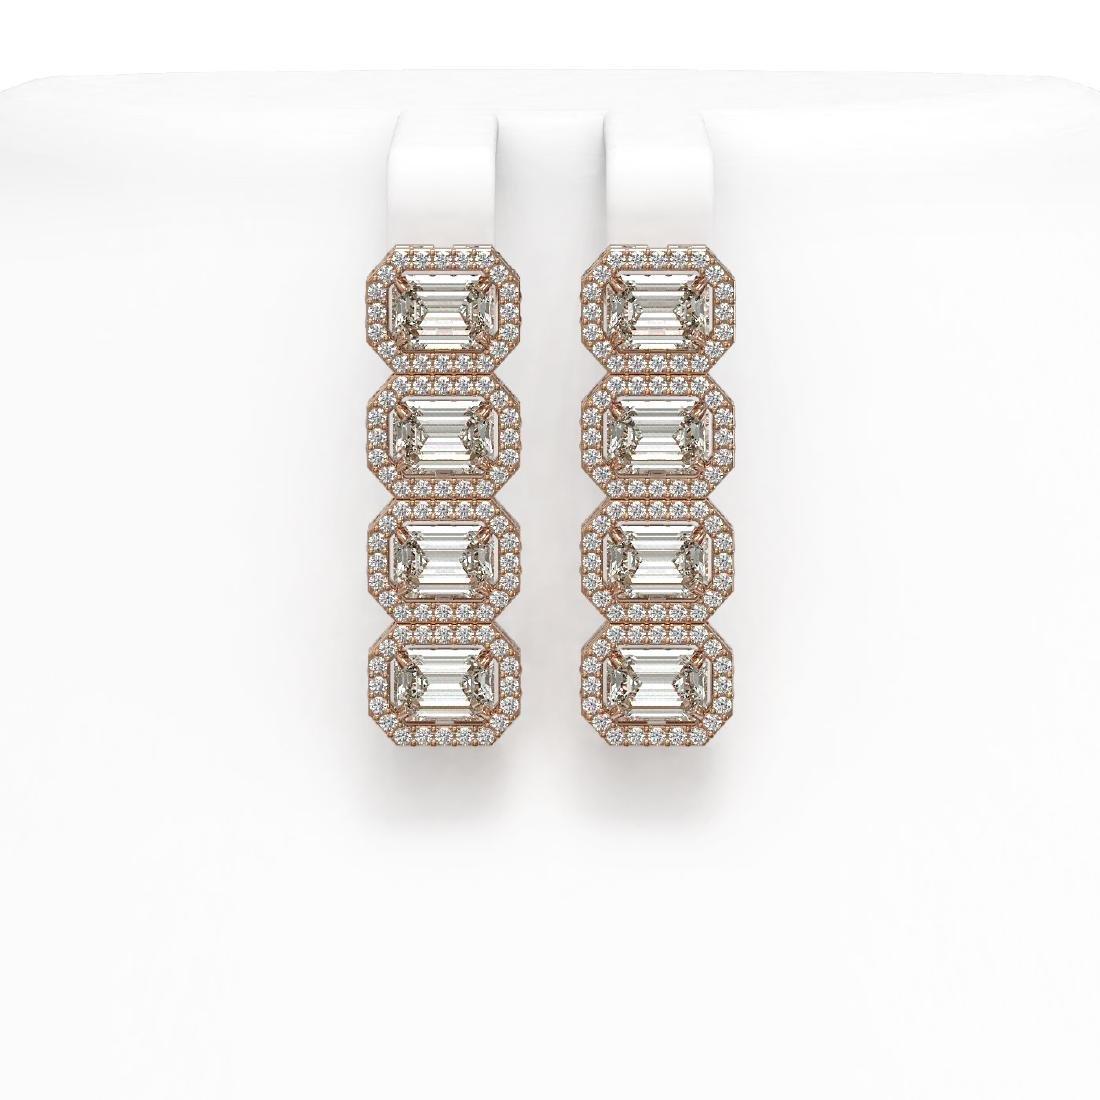 5.33 CTW Emerald Cut Diamond Designer Earrings 18K Rose